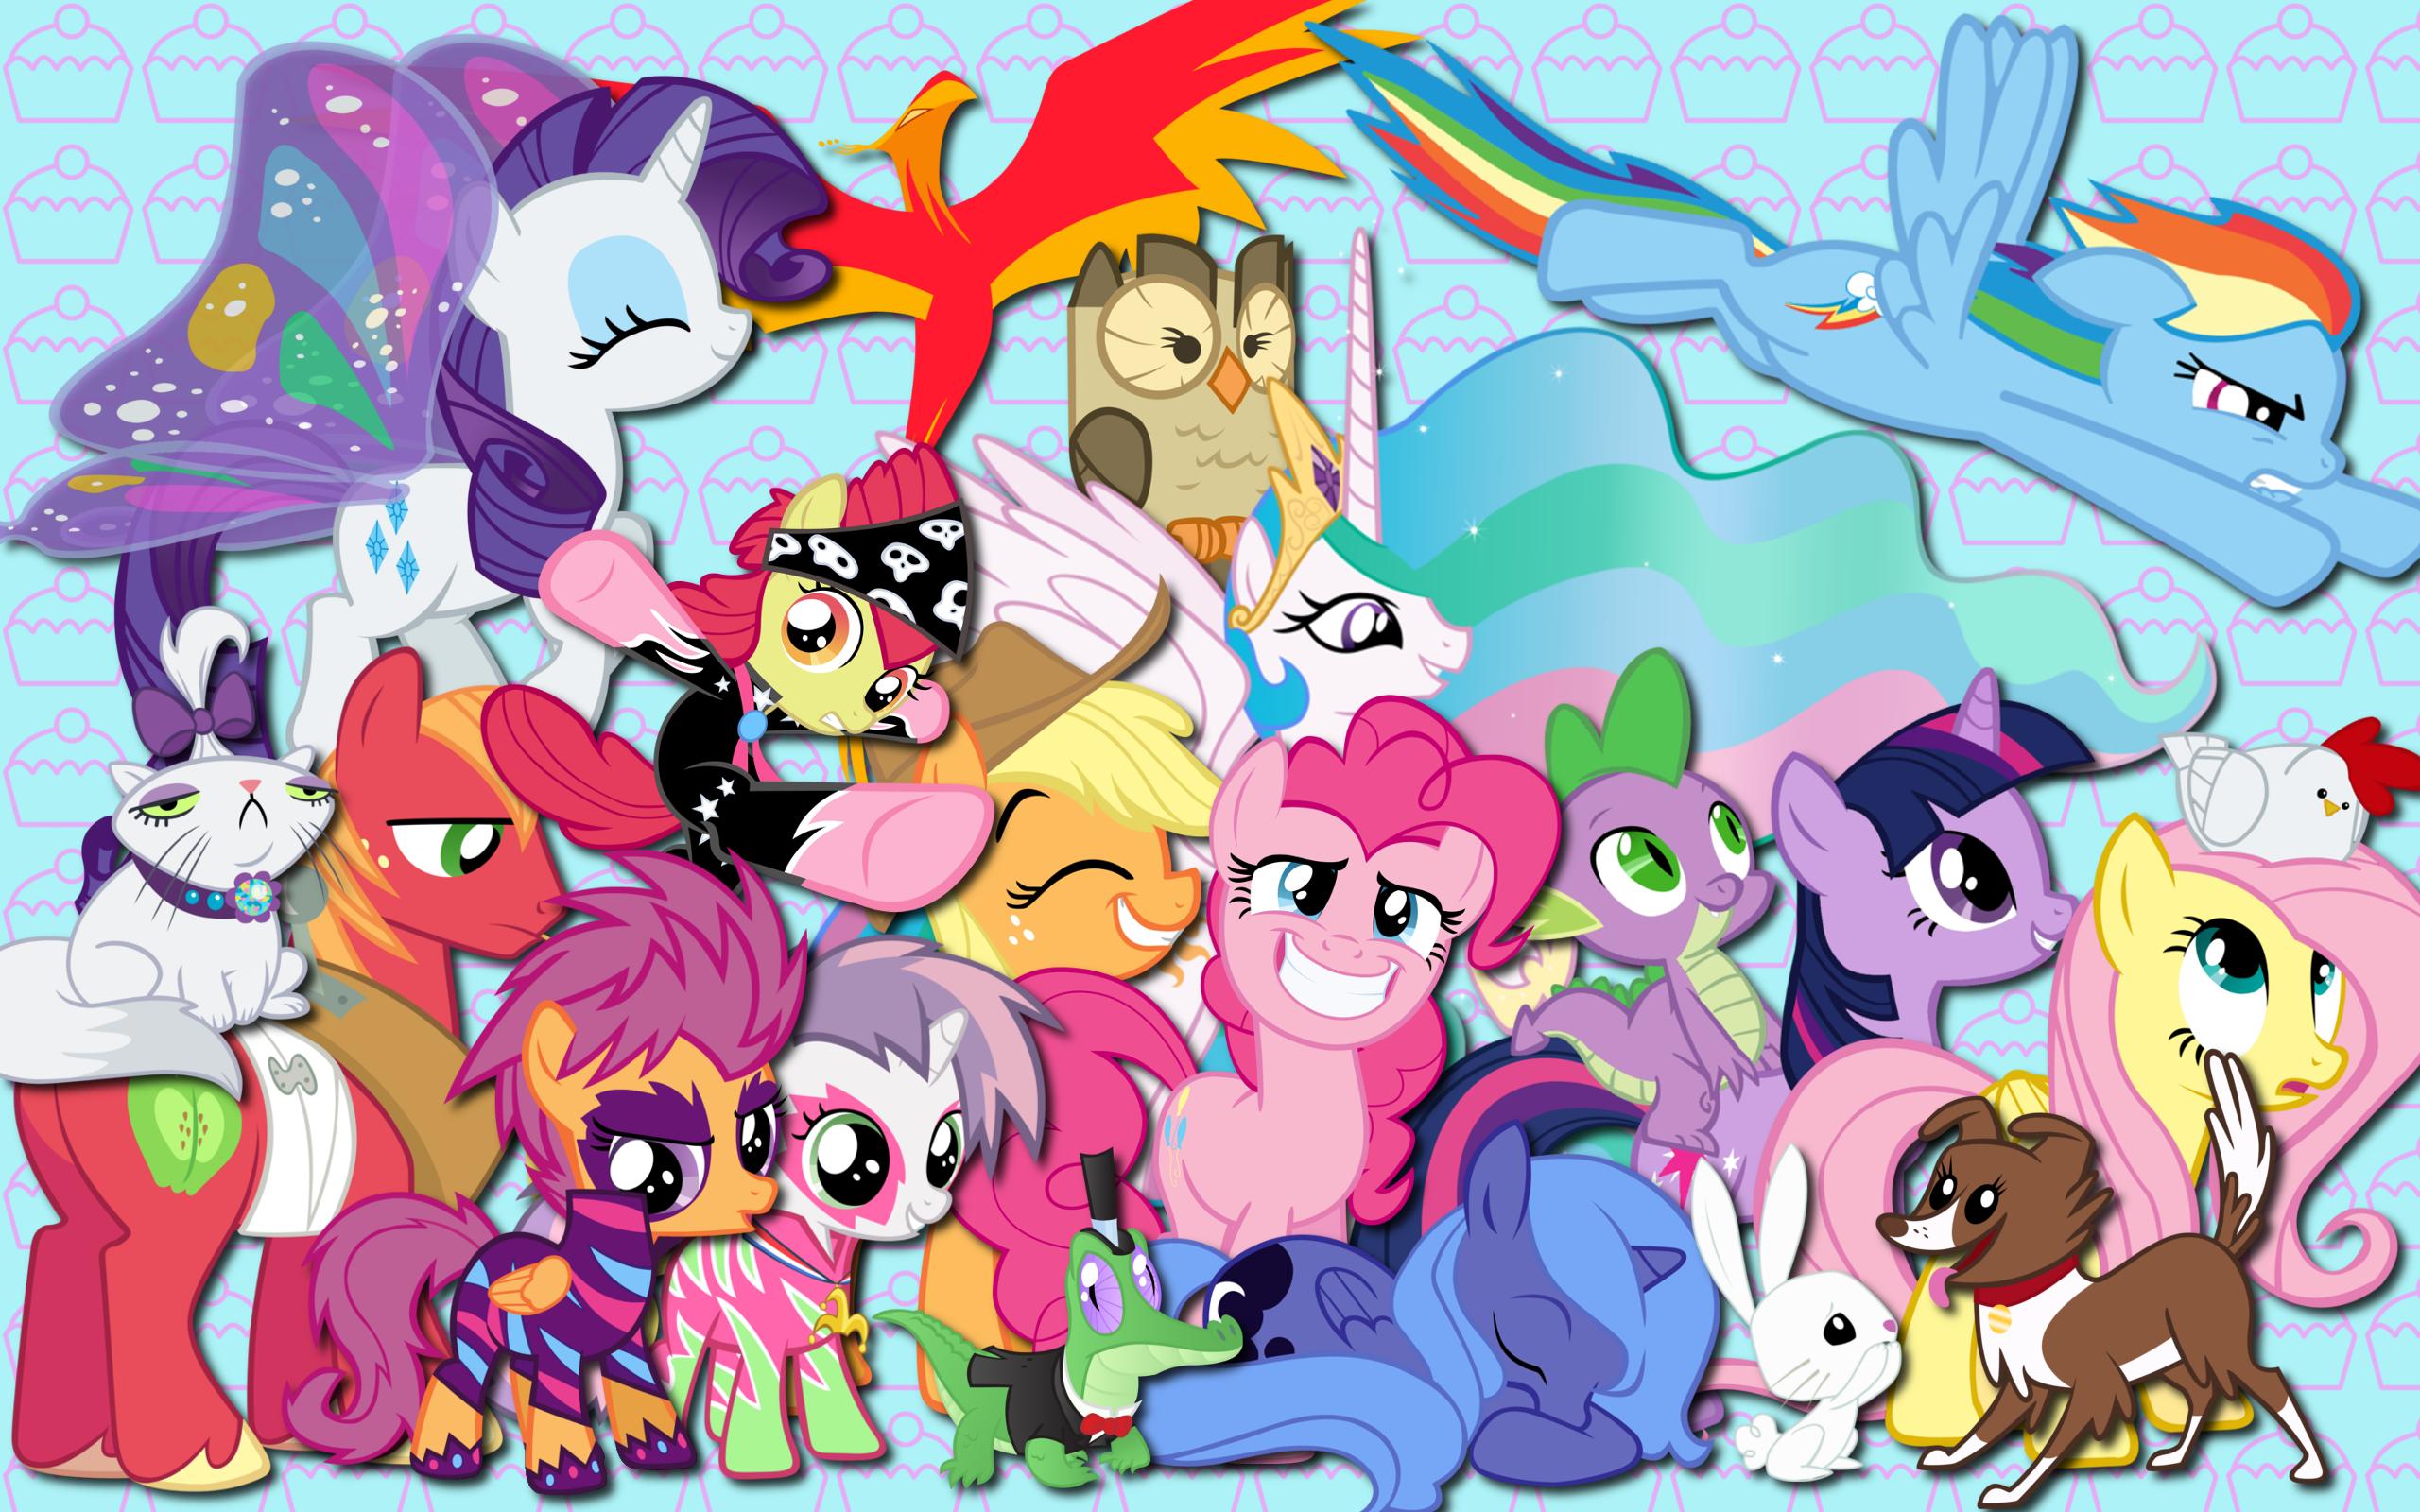 Main ponies and friends WP by Alexstrazse, AliceHumanSacrifice0, AtomicGreymon, Felix-KoT, kurokaji11, metalbeersolid, MoongazePonies, NightmareMoonS, purplefairy456, Shelmo69, solusjbj, SpittiePie and WraithX79